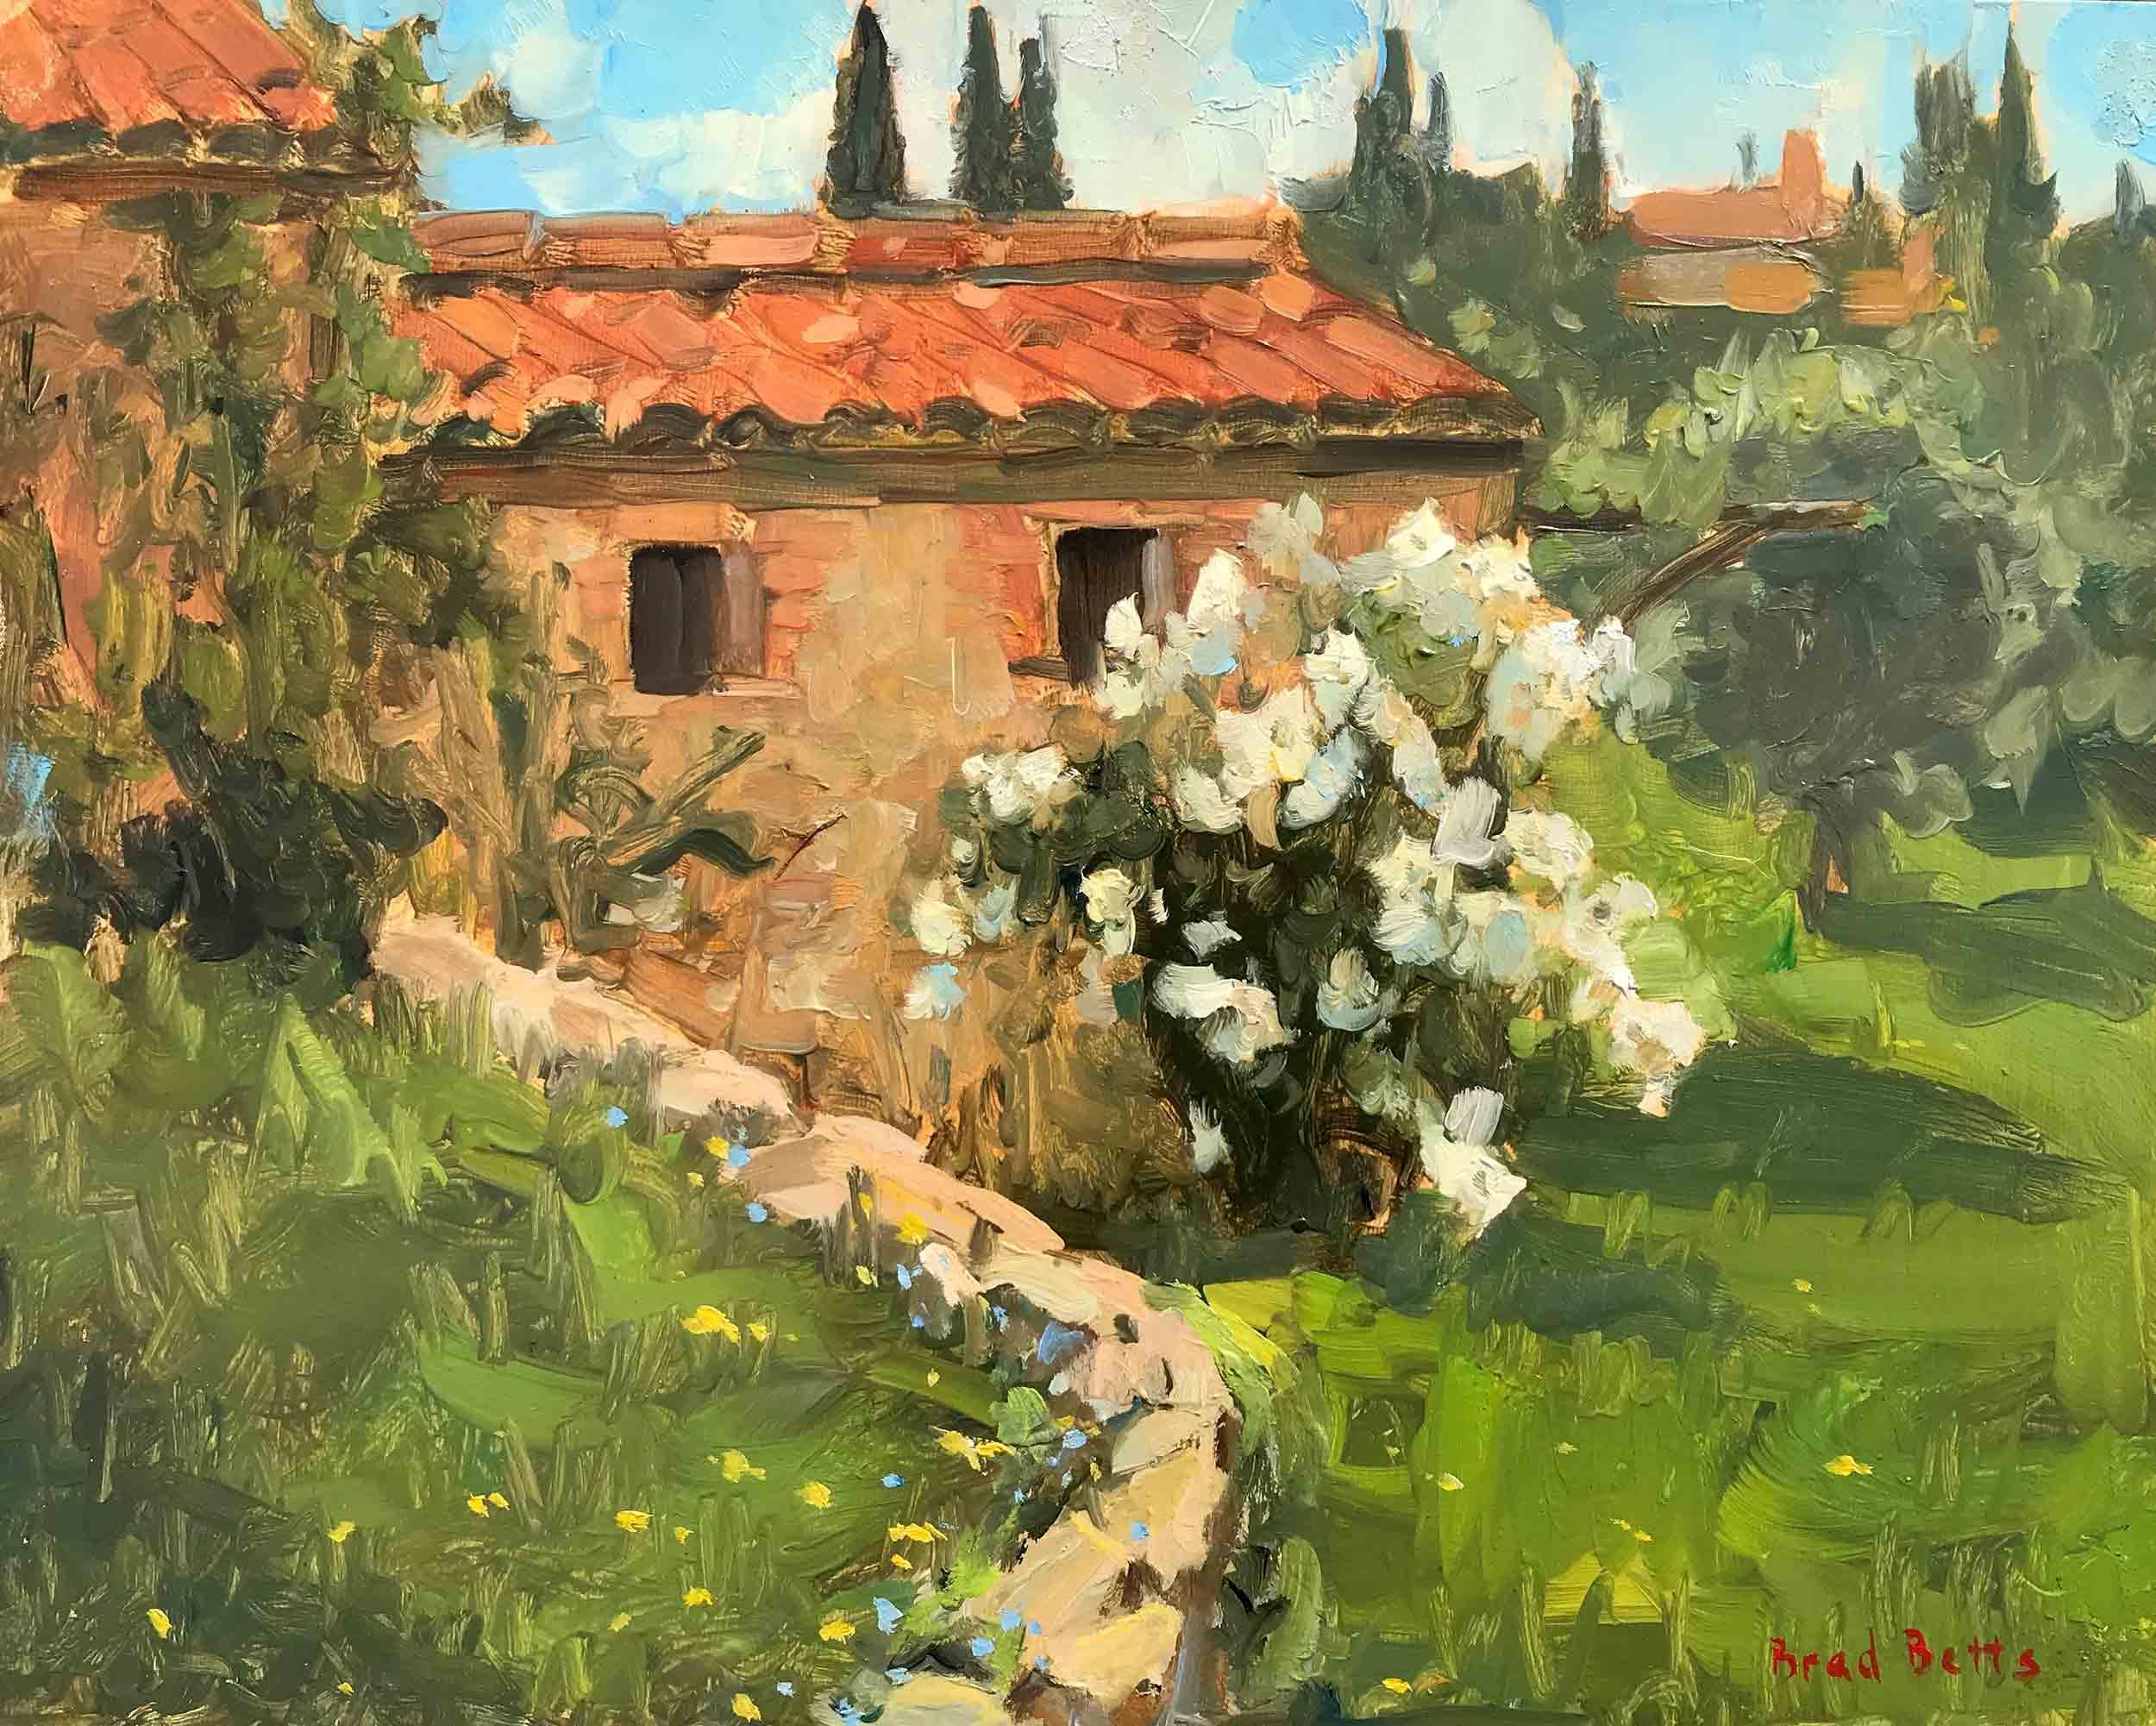 Tuscan Roses